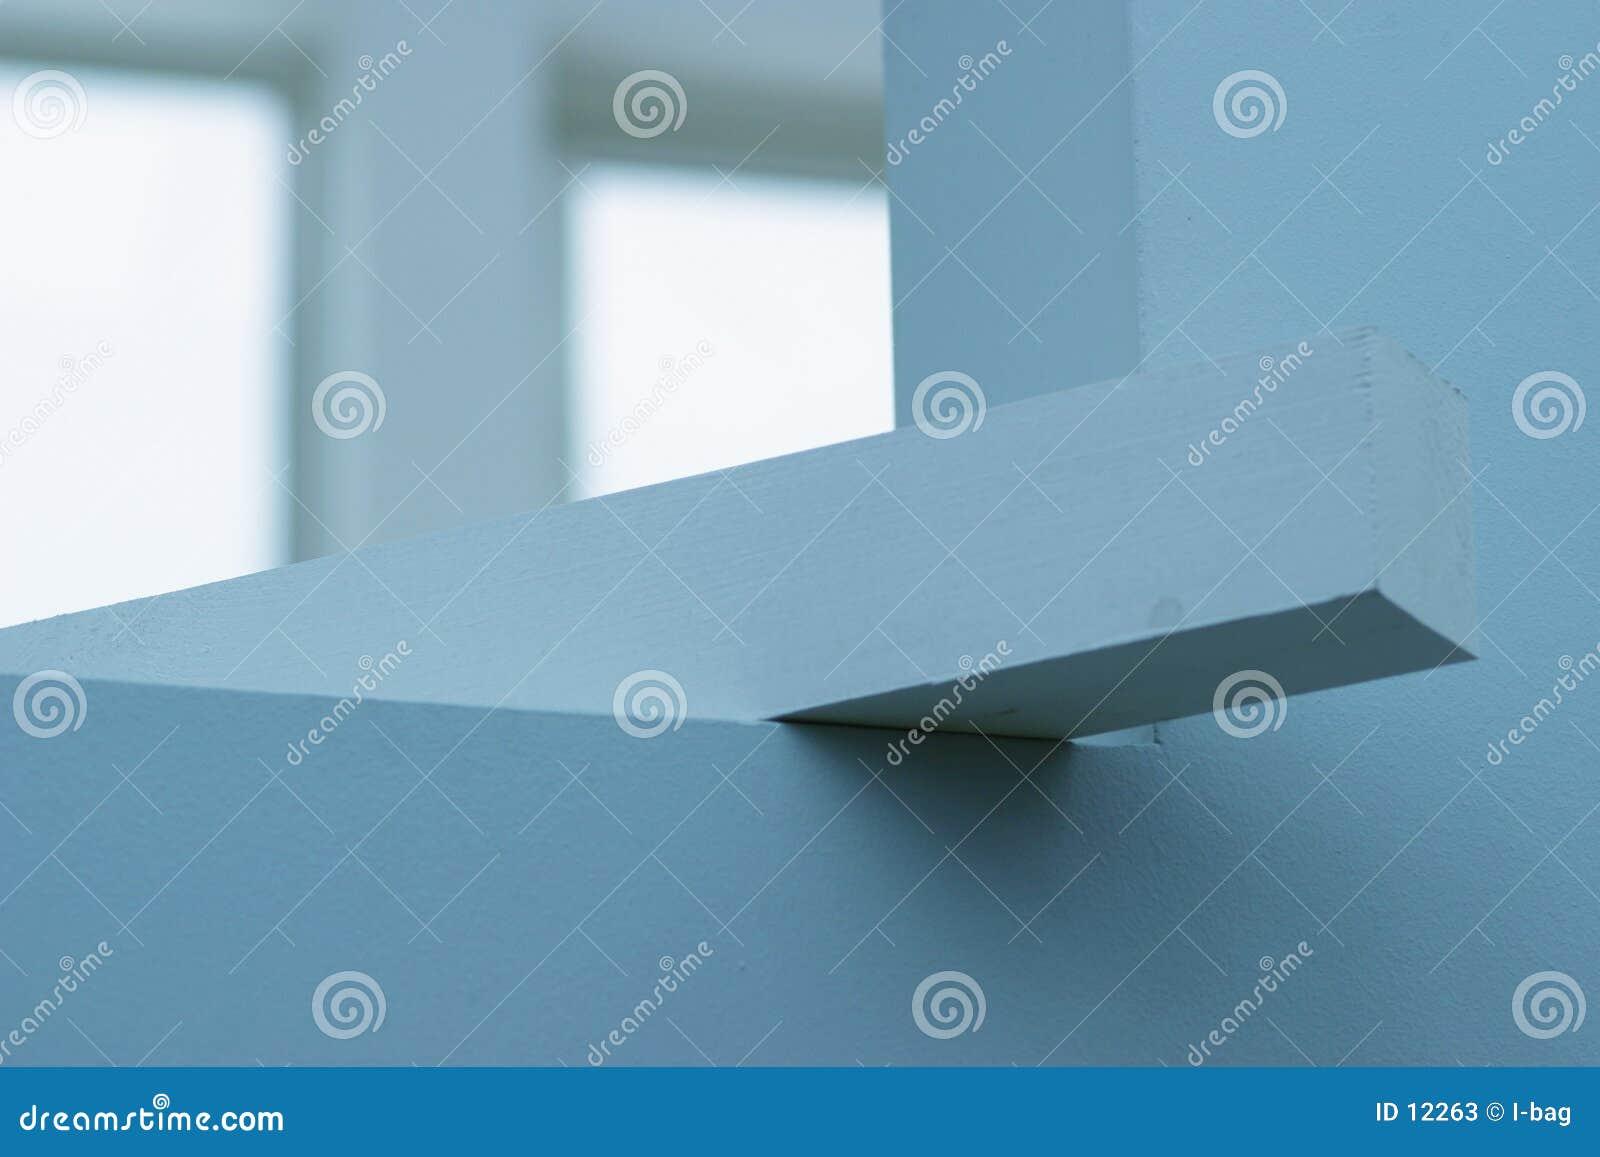 Balanced beam